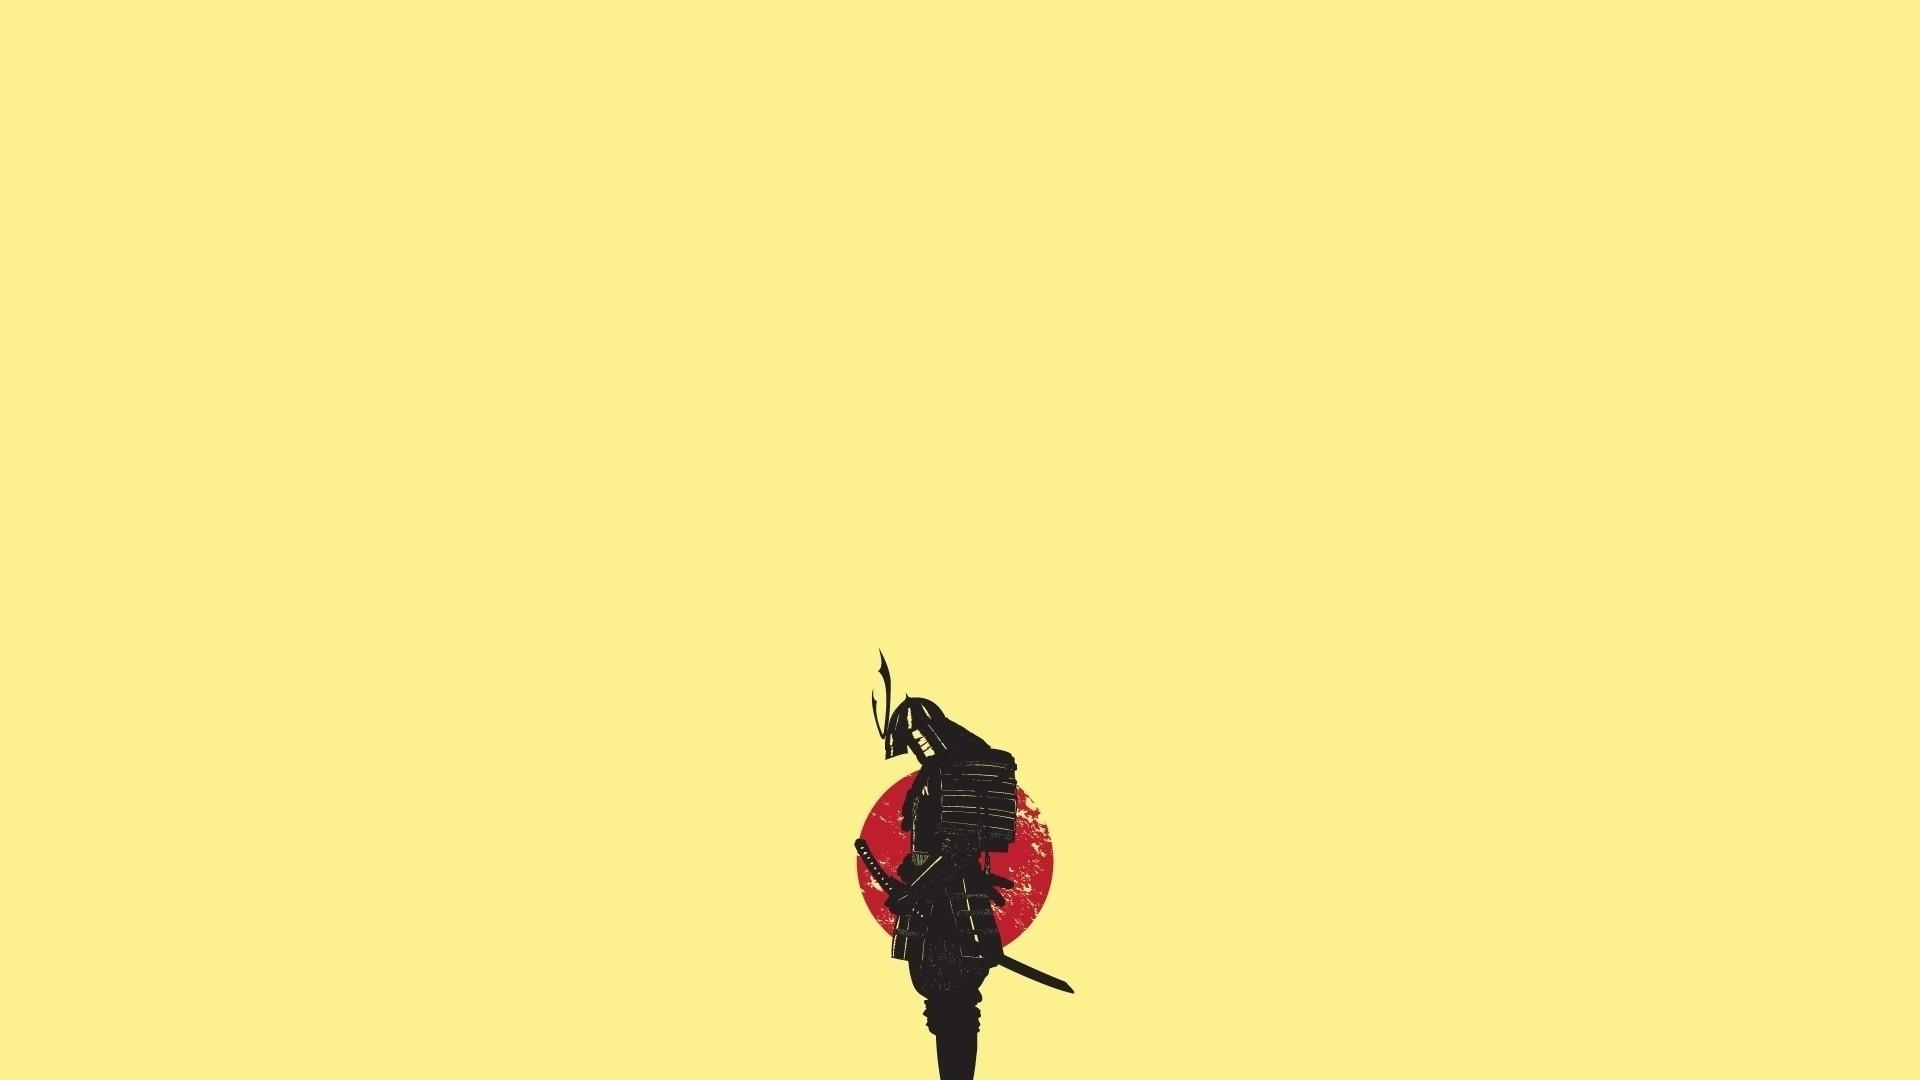 abstract_minimalistic_samurai__1920x1080_wallpaperhi.com